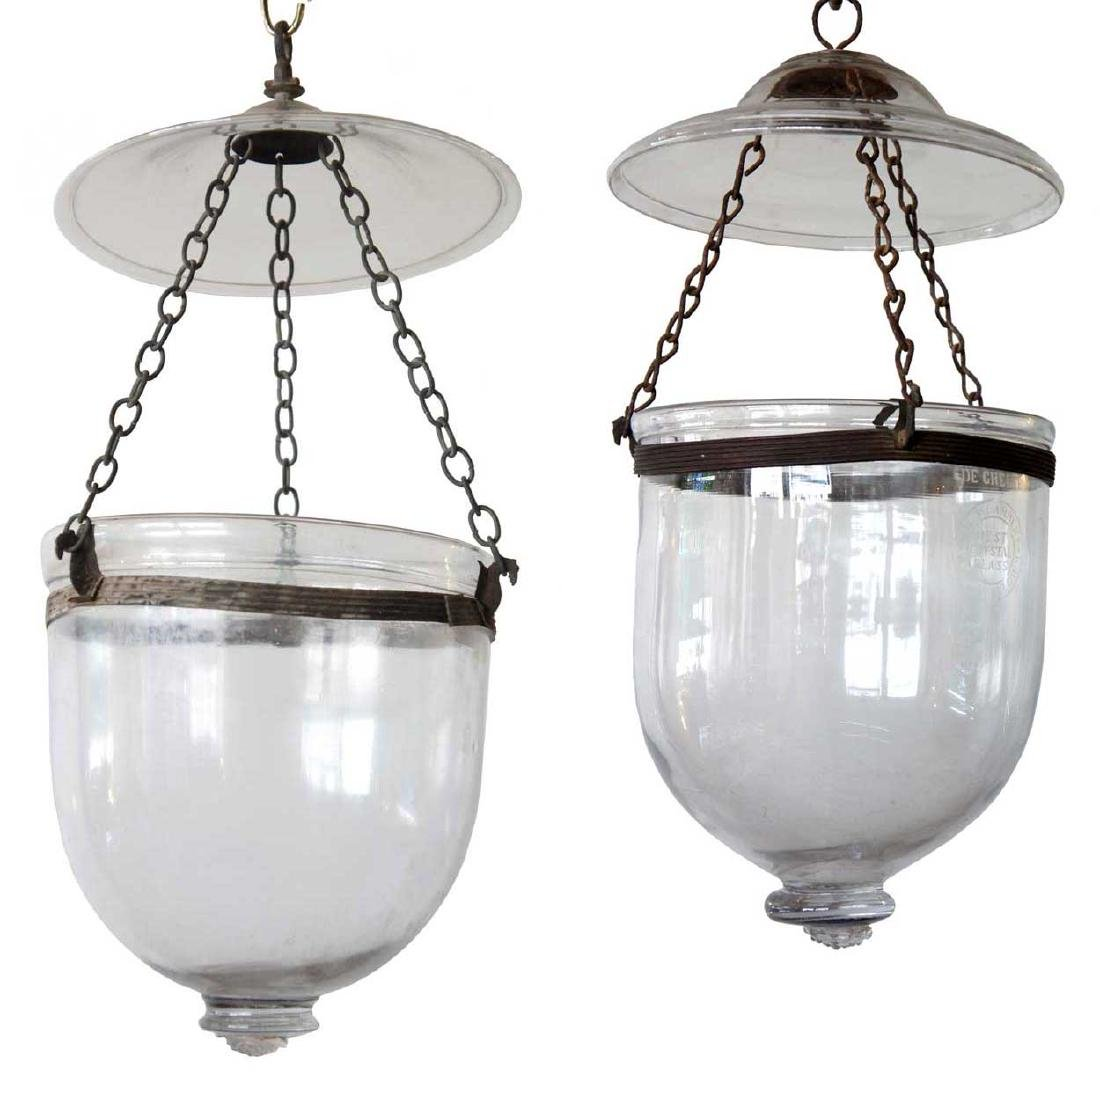 Two Anglo Indian Glass Hanging Hall Lights